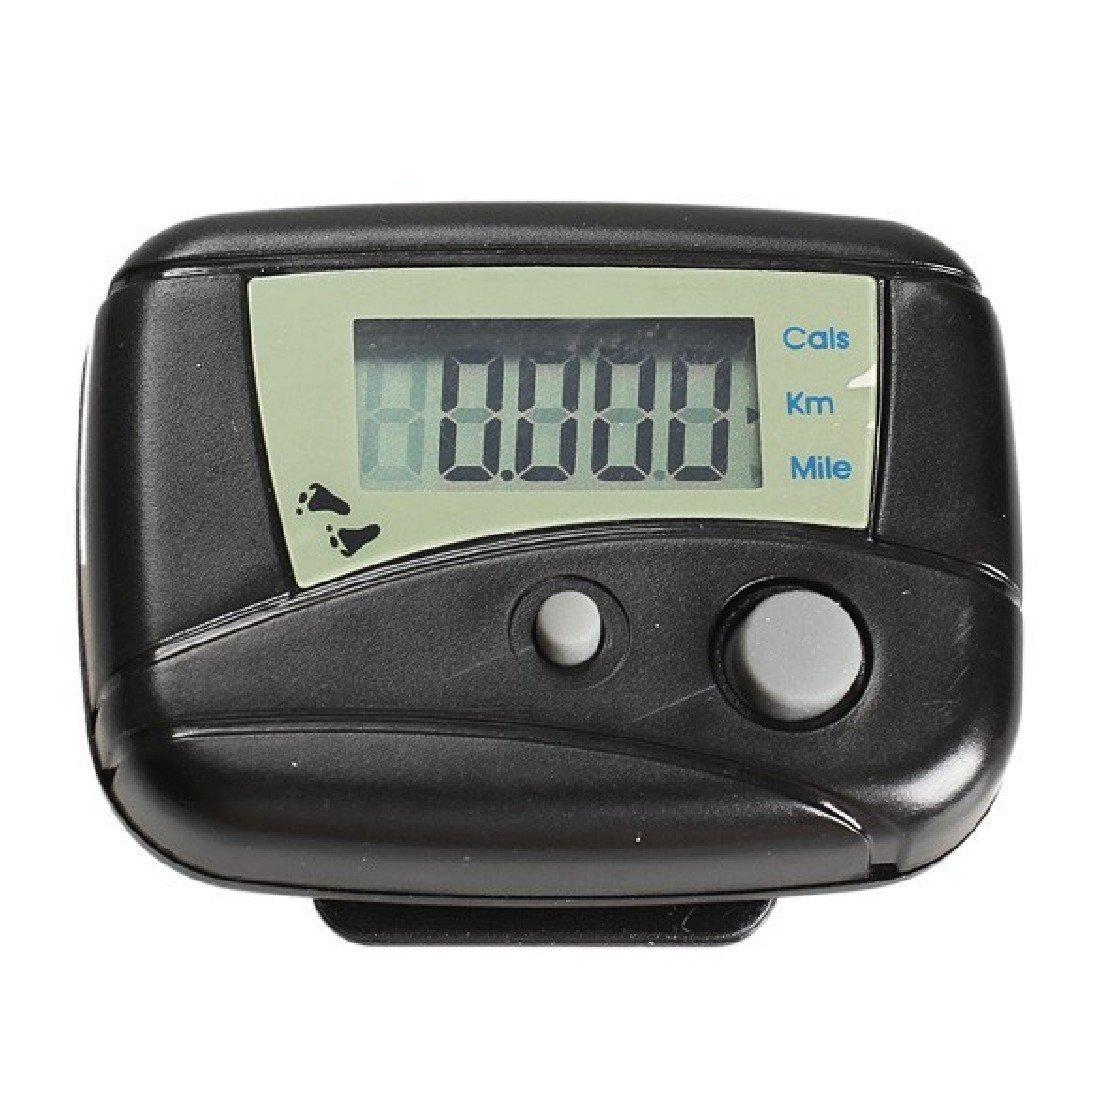 Black Digital Lcd 1Pcs Run Step Movement Run Pedometer Walking Calorie Counter Distance Step Counter